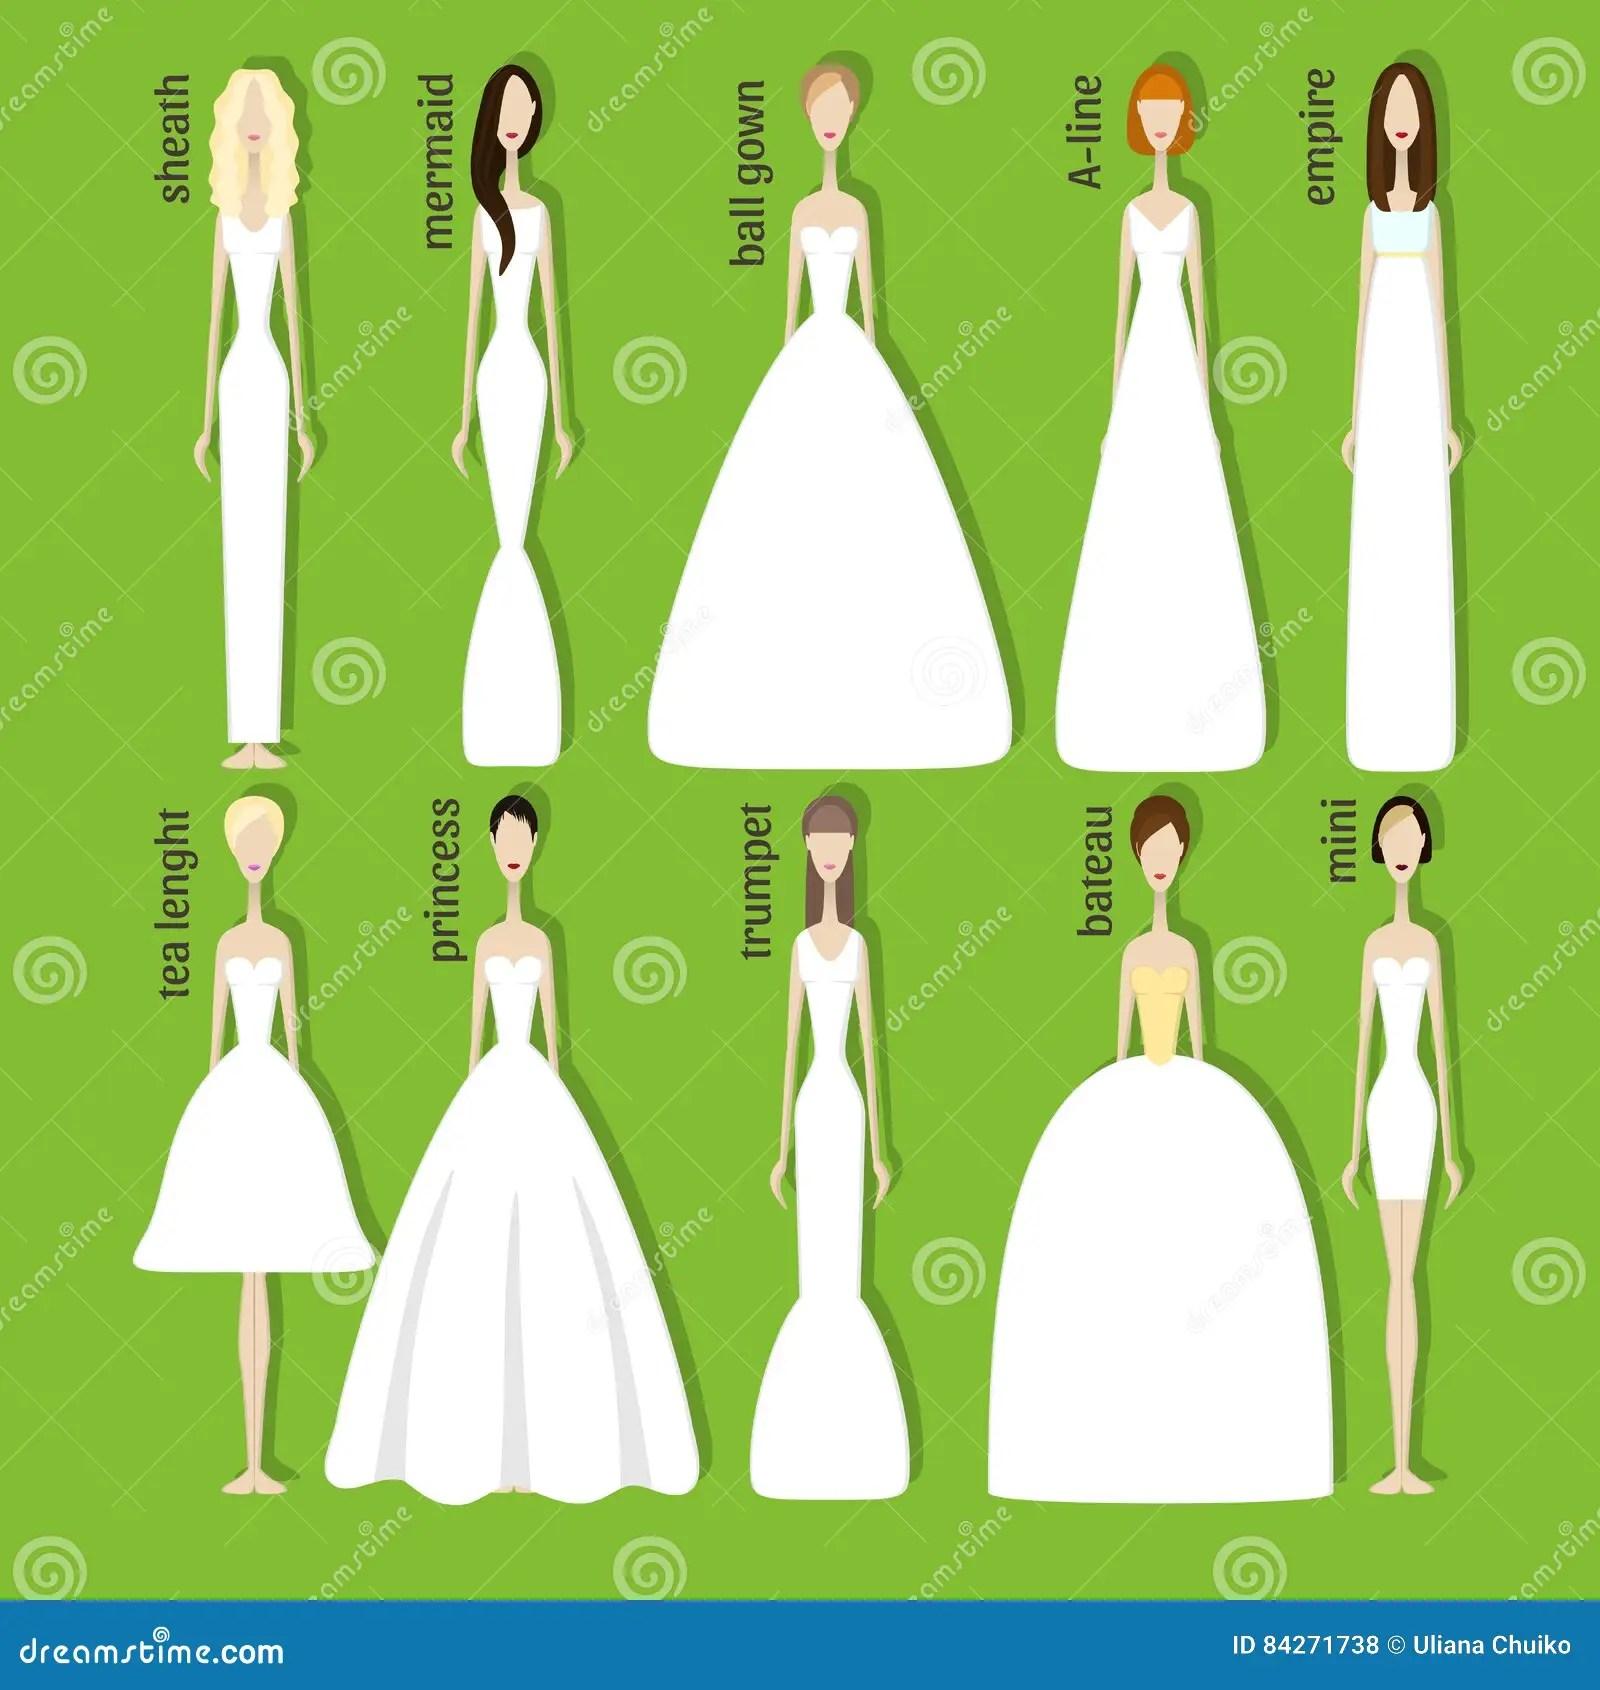 brides in different dresses